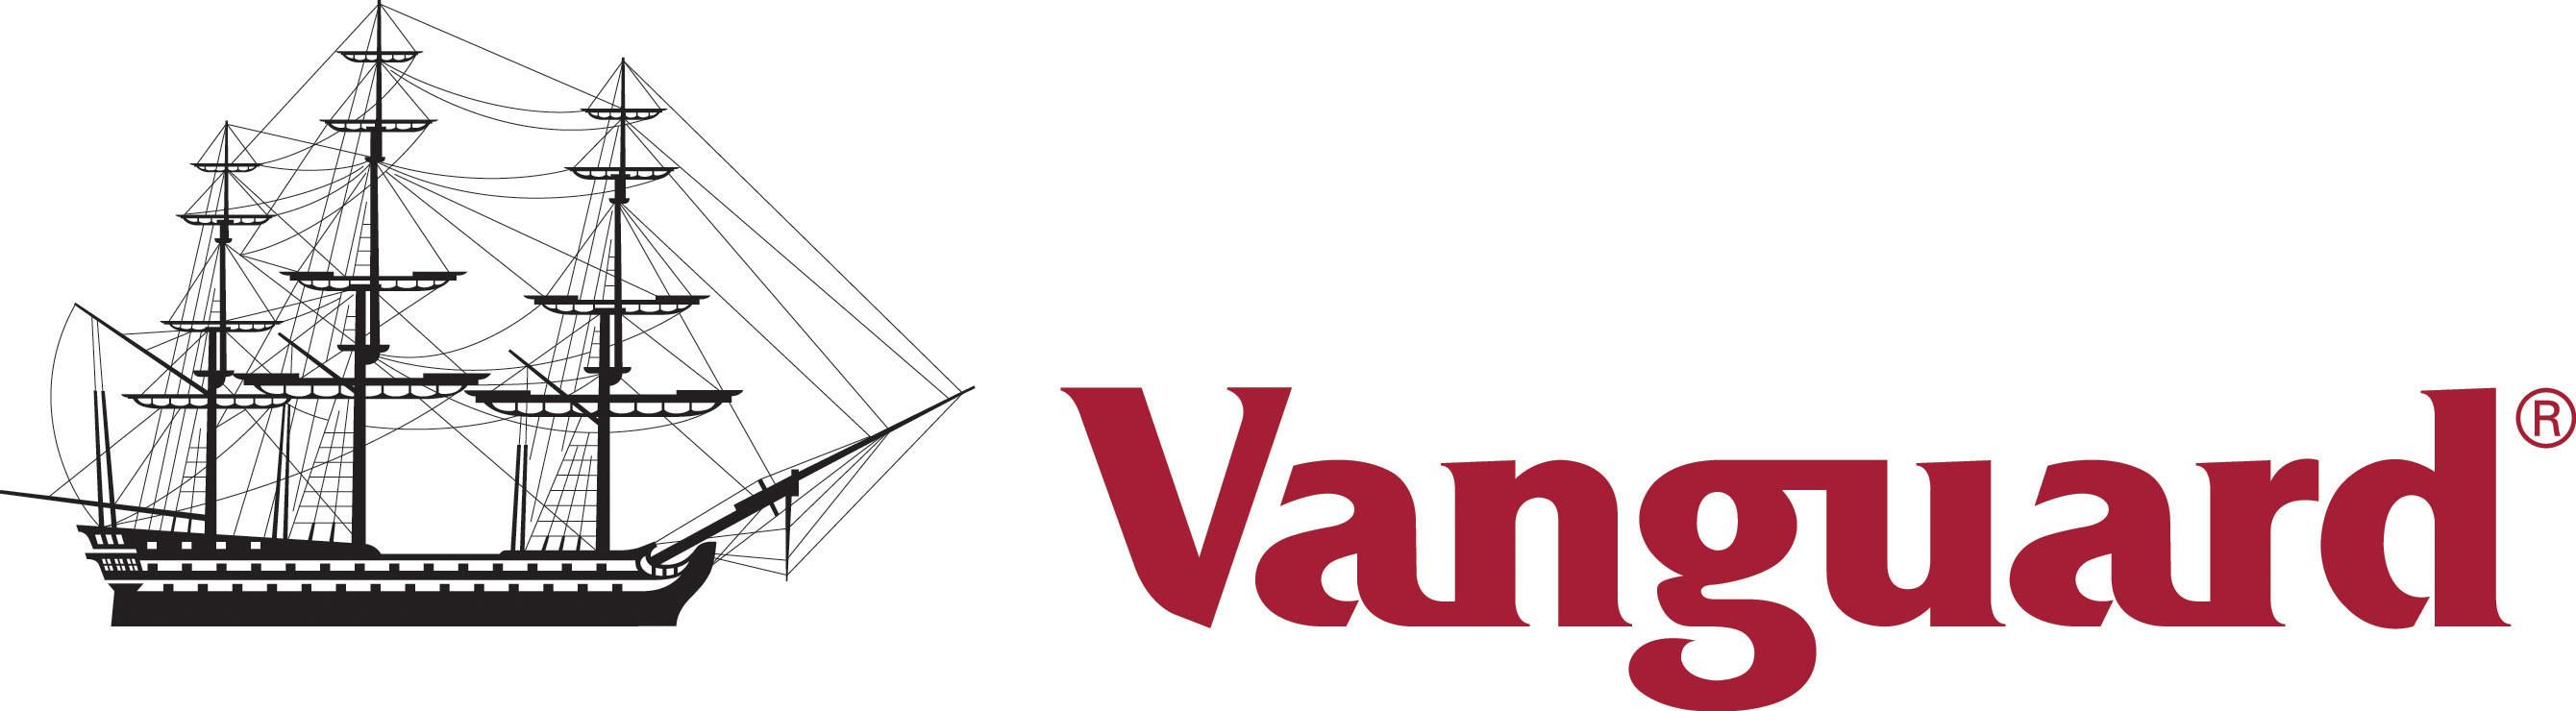 Vanguard Group logo.